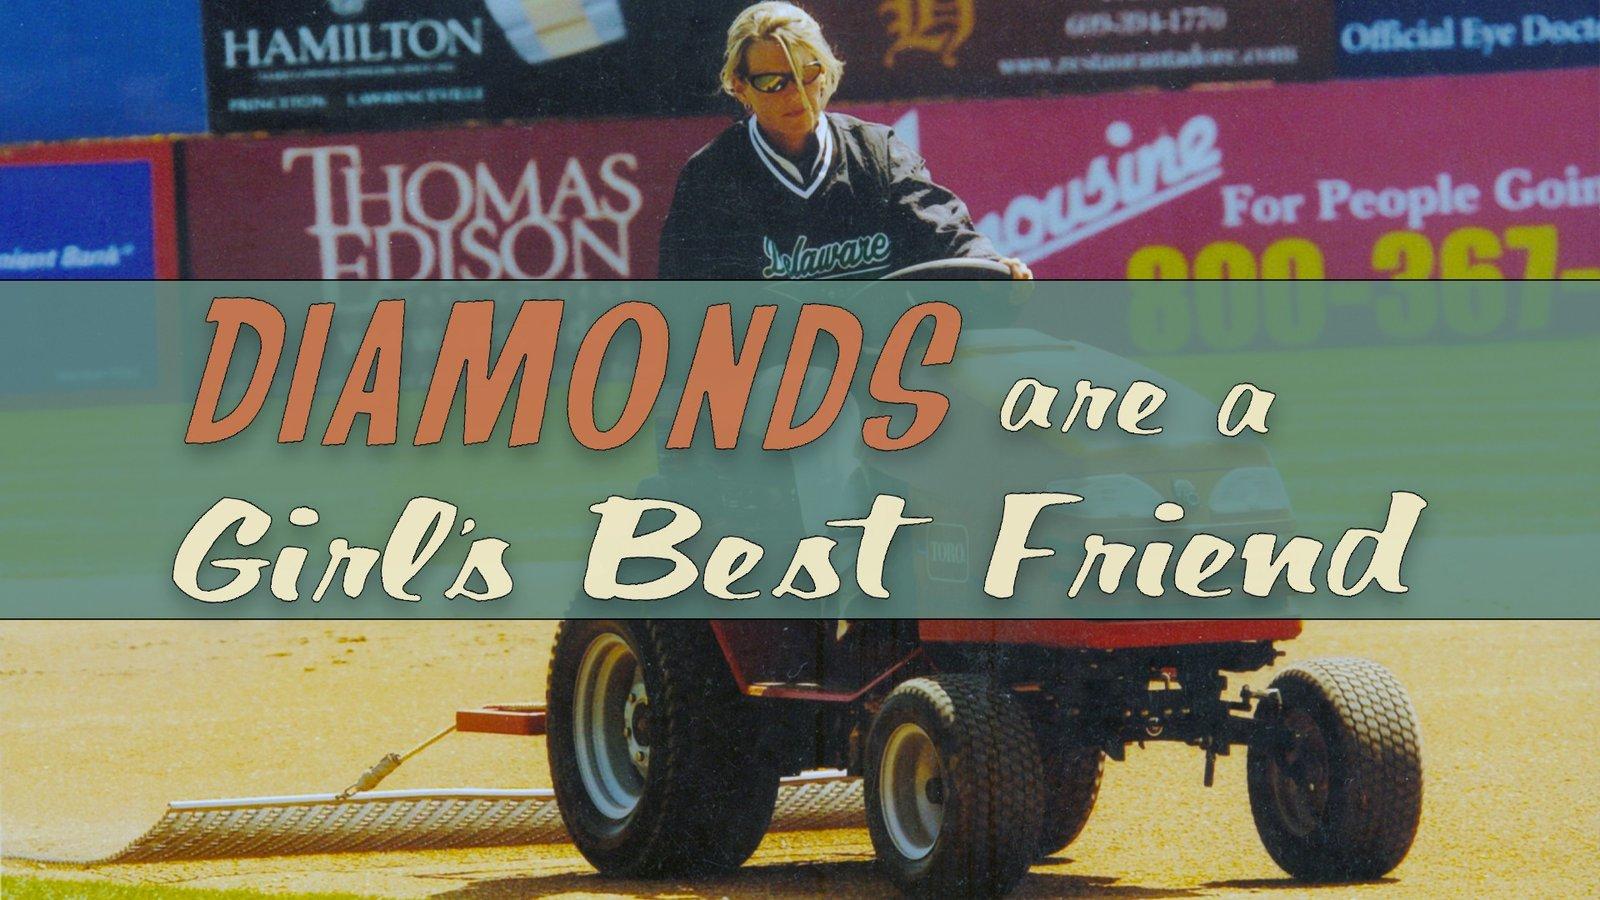 Diamonds Are a Girl's Best Friend - Women in Sports Careers